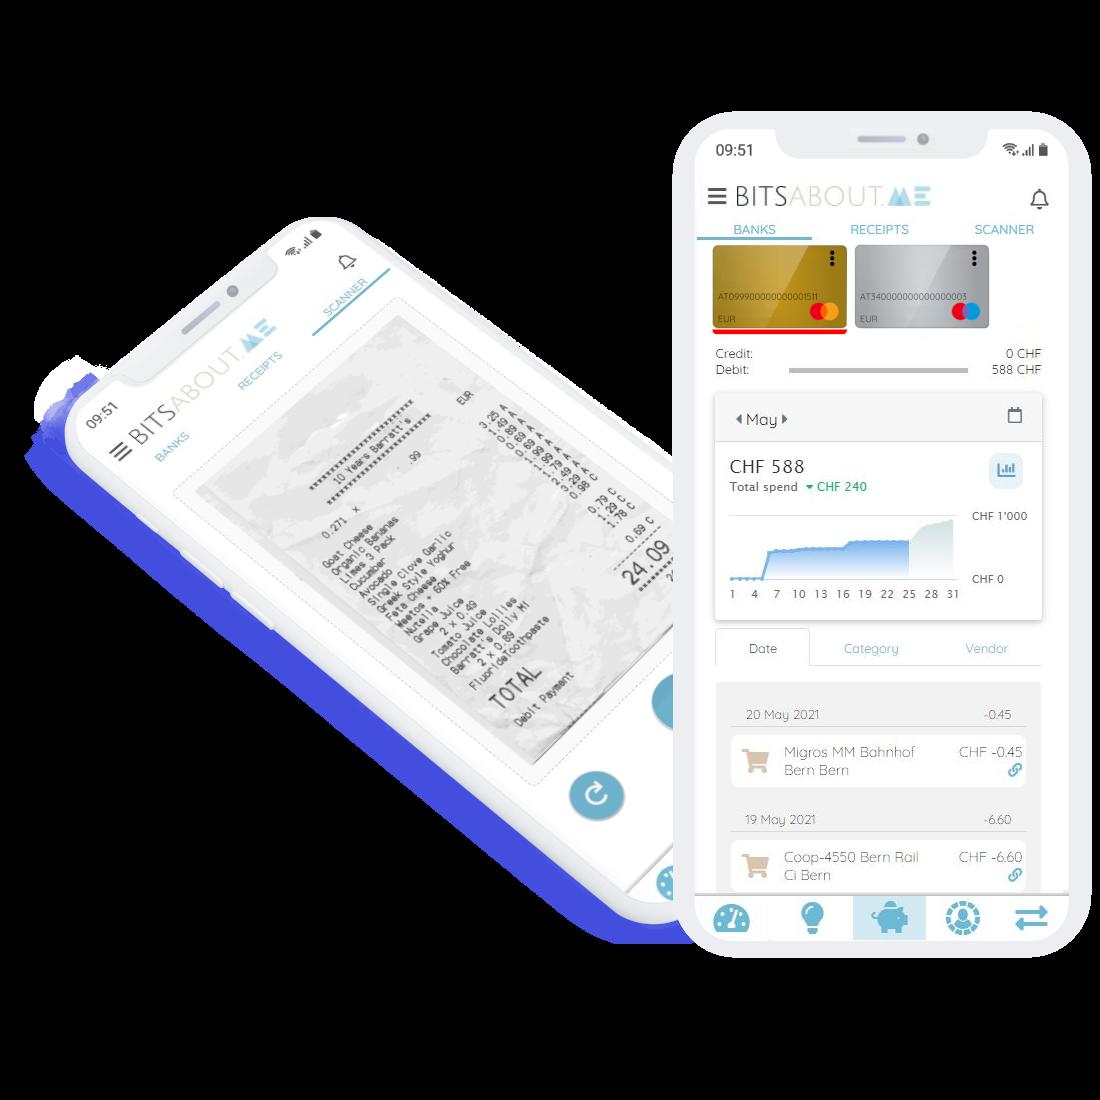 Personal Finance Management auf BitsaboutMe